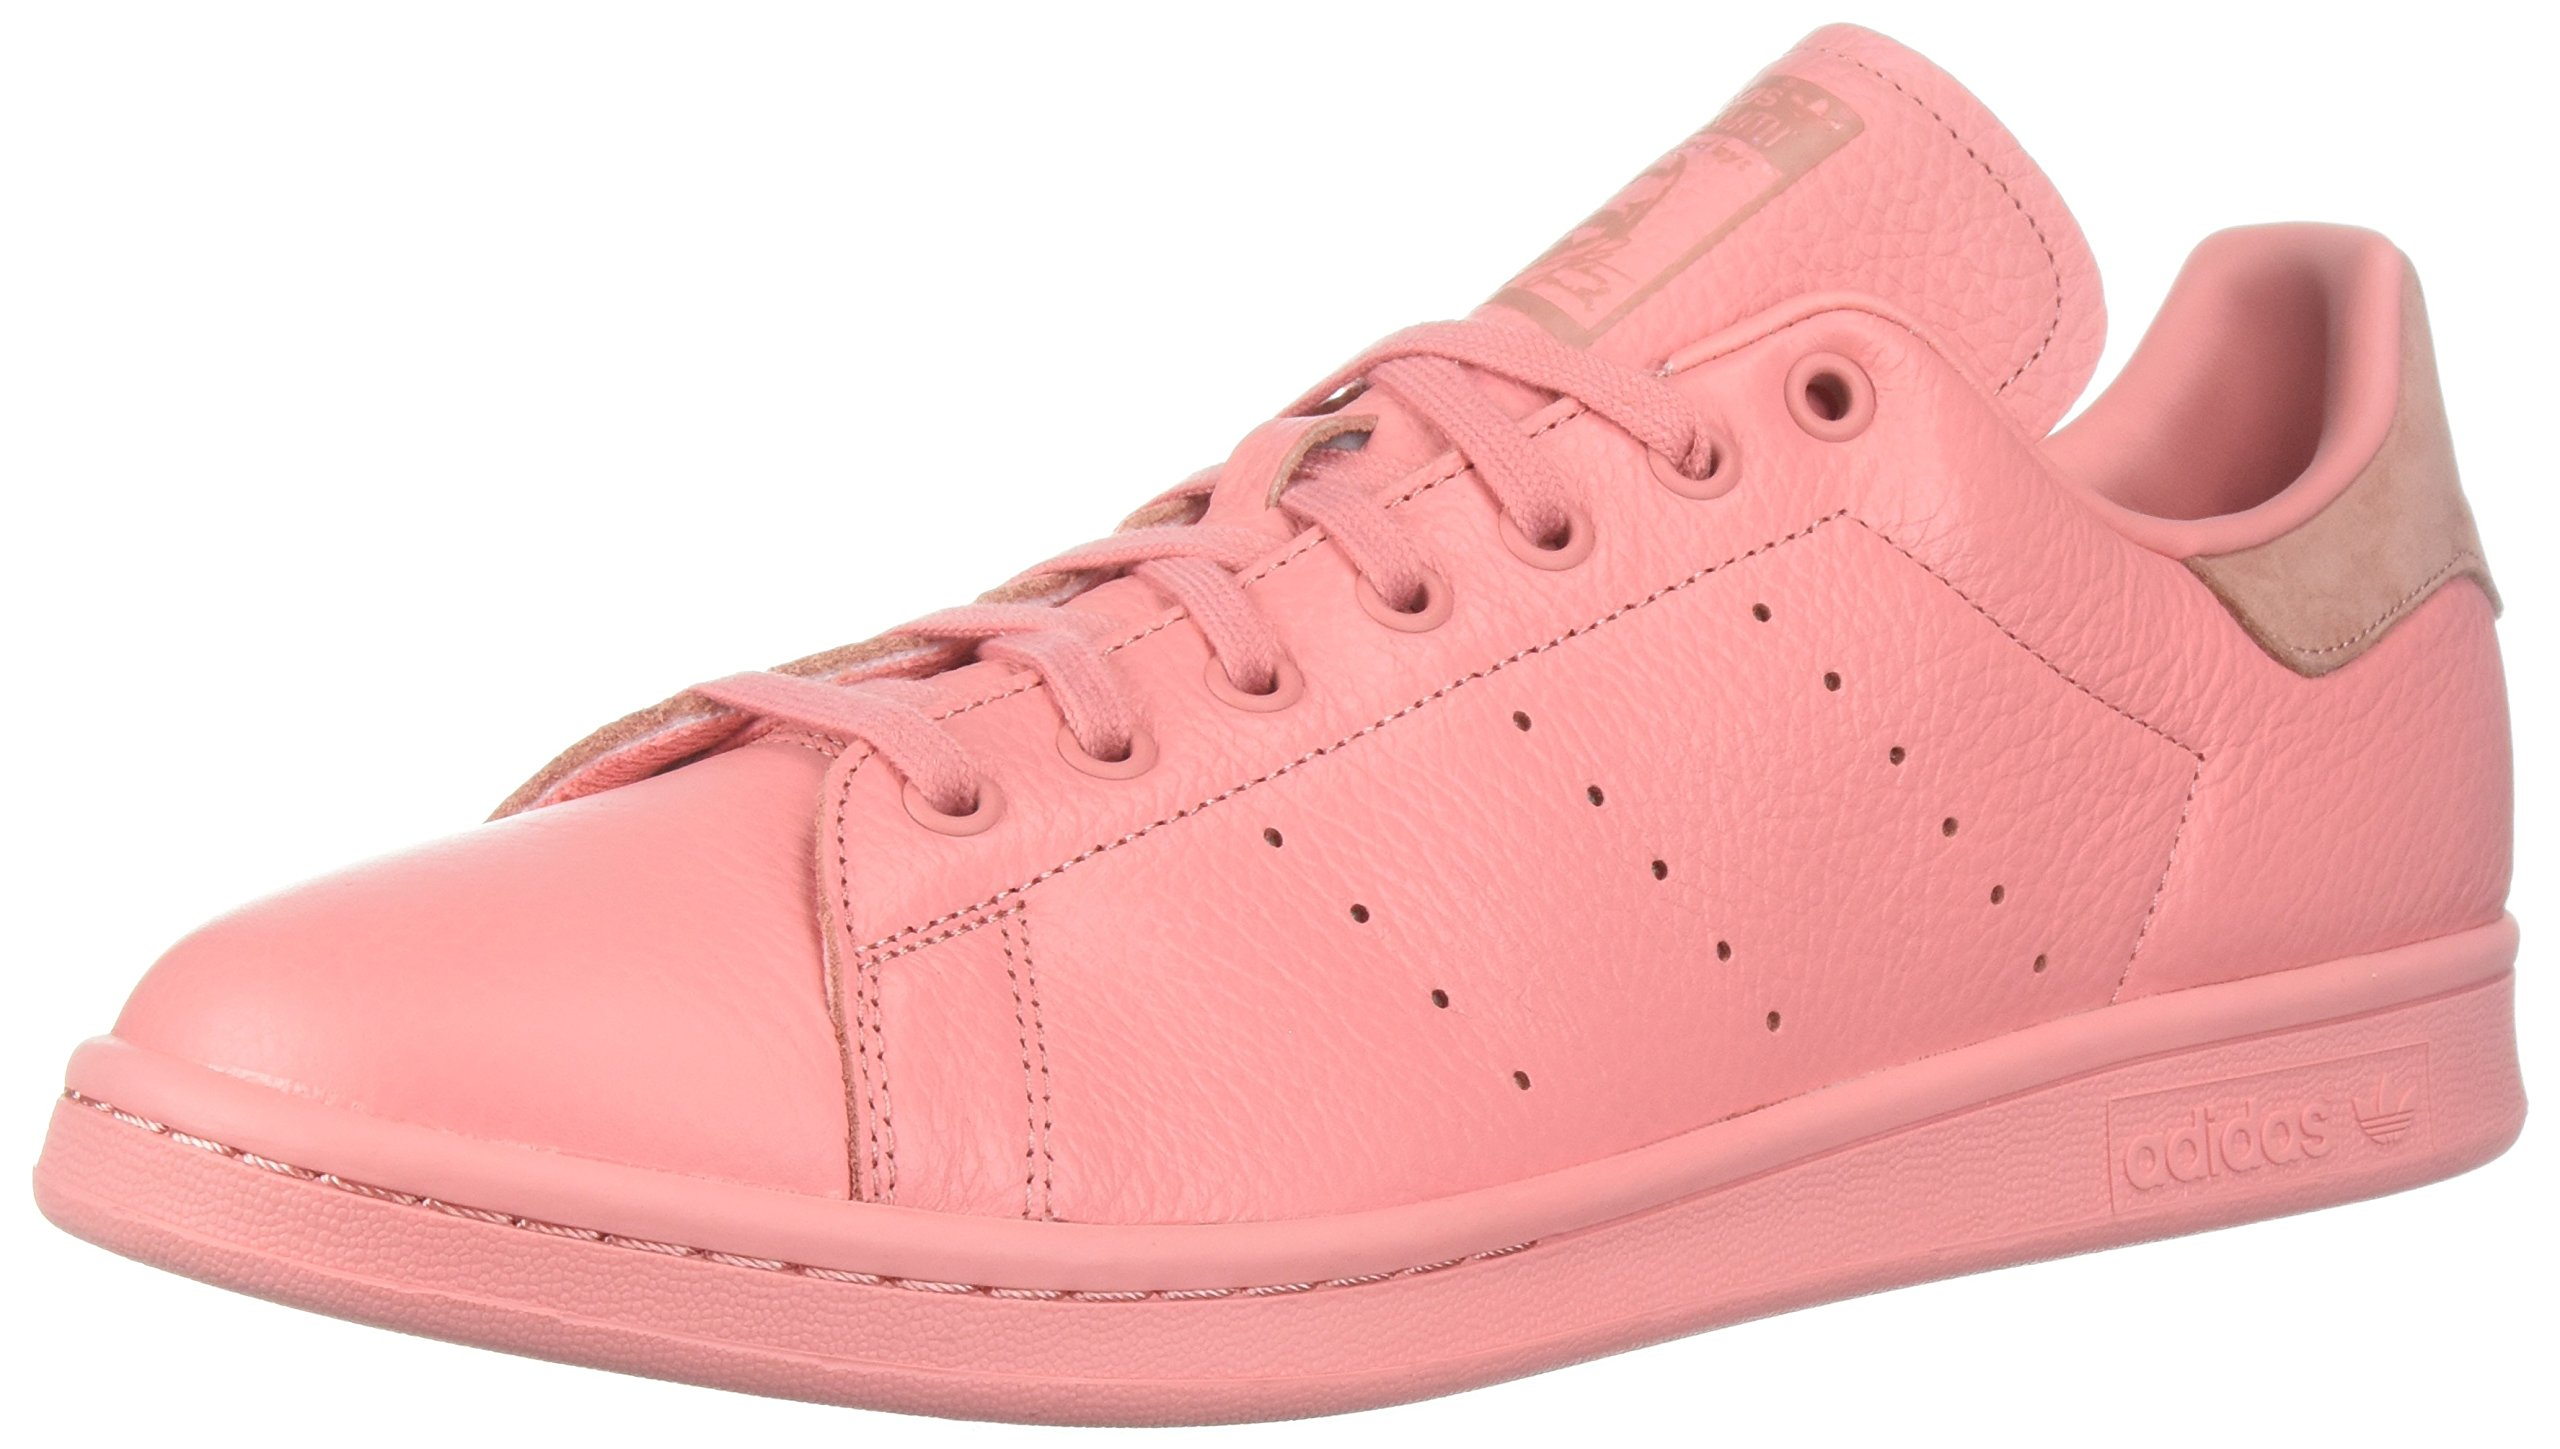 4a3b2440ae9d Galleon - Adidas Originals Men s Stan Smith Sneaker